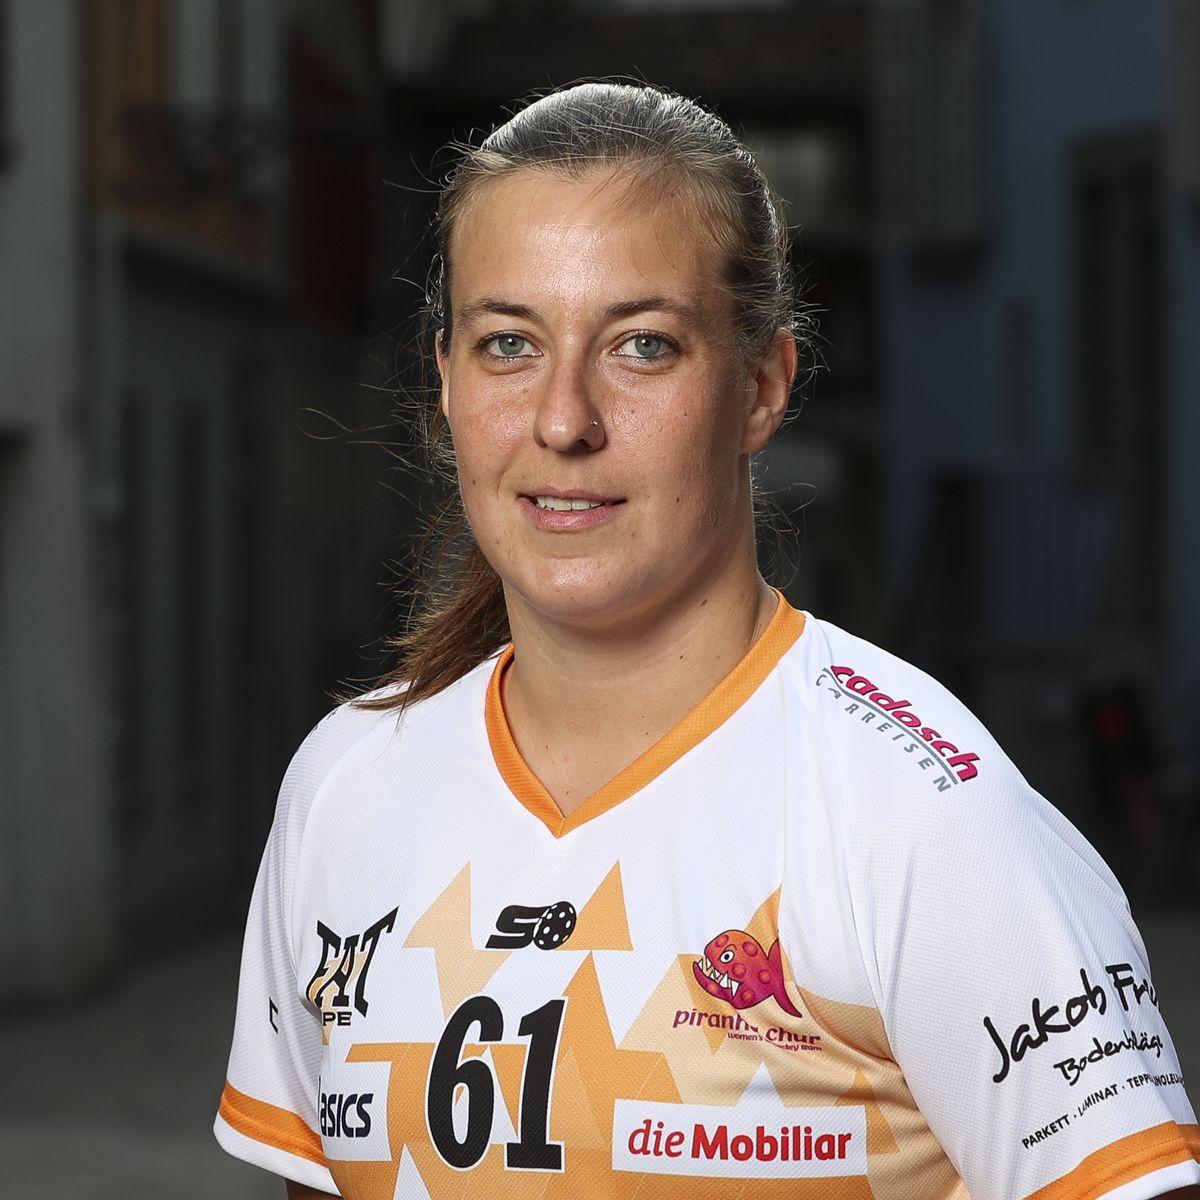 Katrin Zwinggi #61_NLA_piranha Chur_Saison 2018-2019_1200x1200_01.jpg